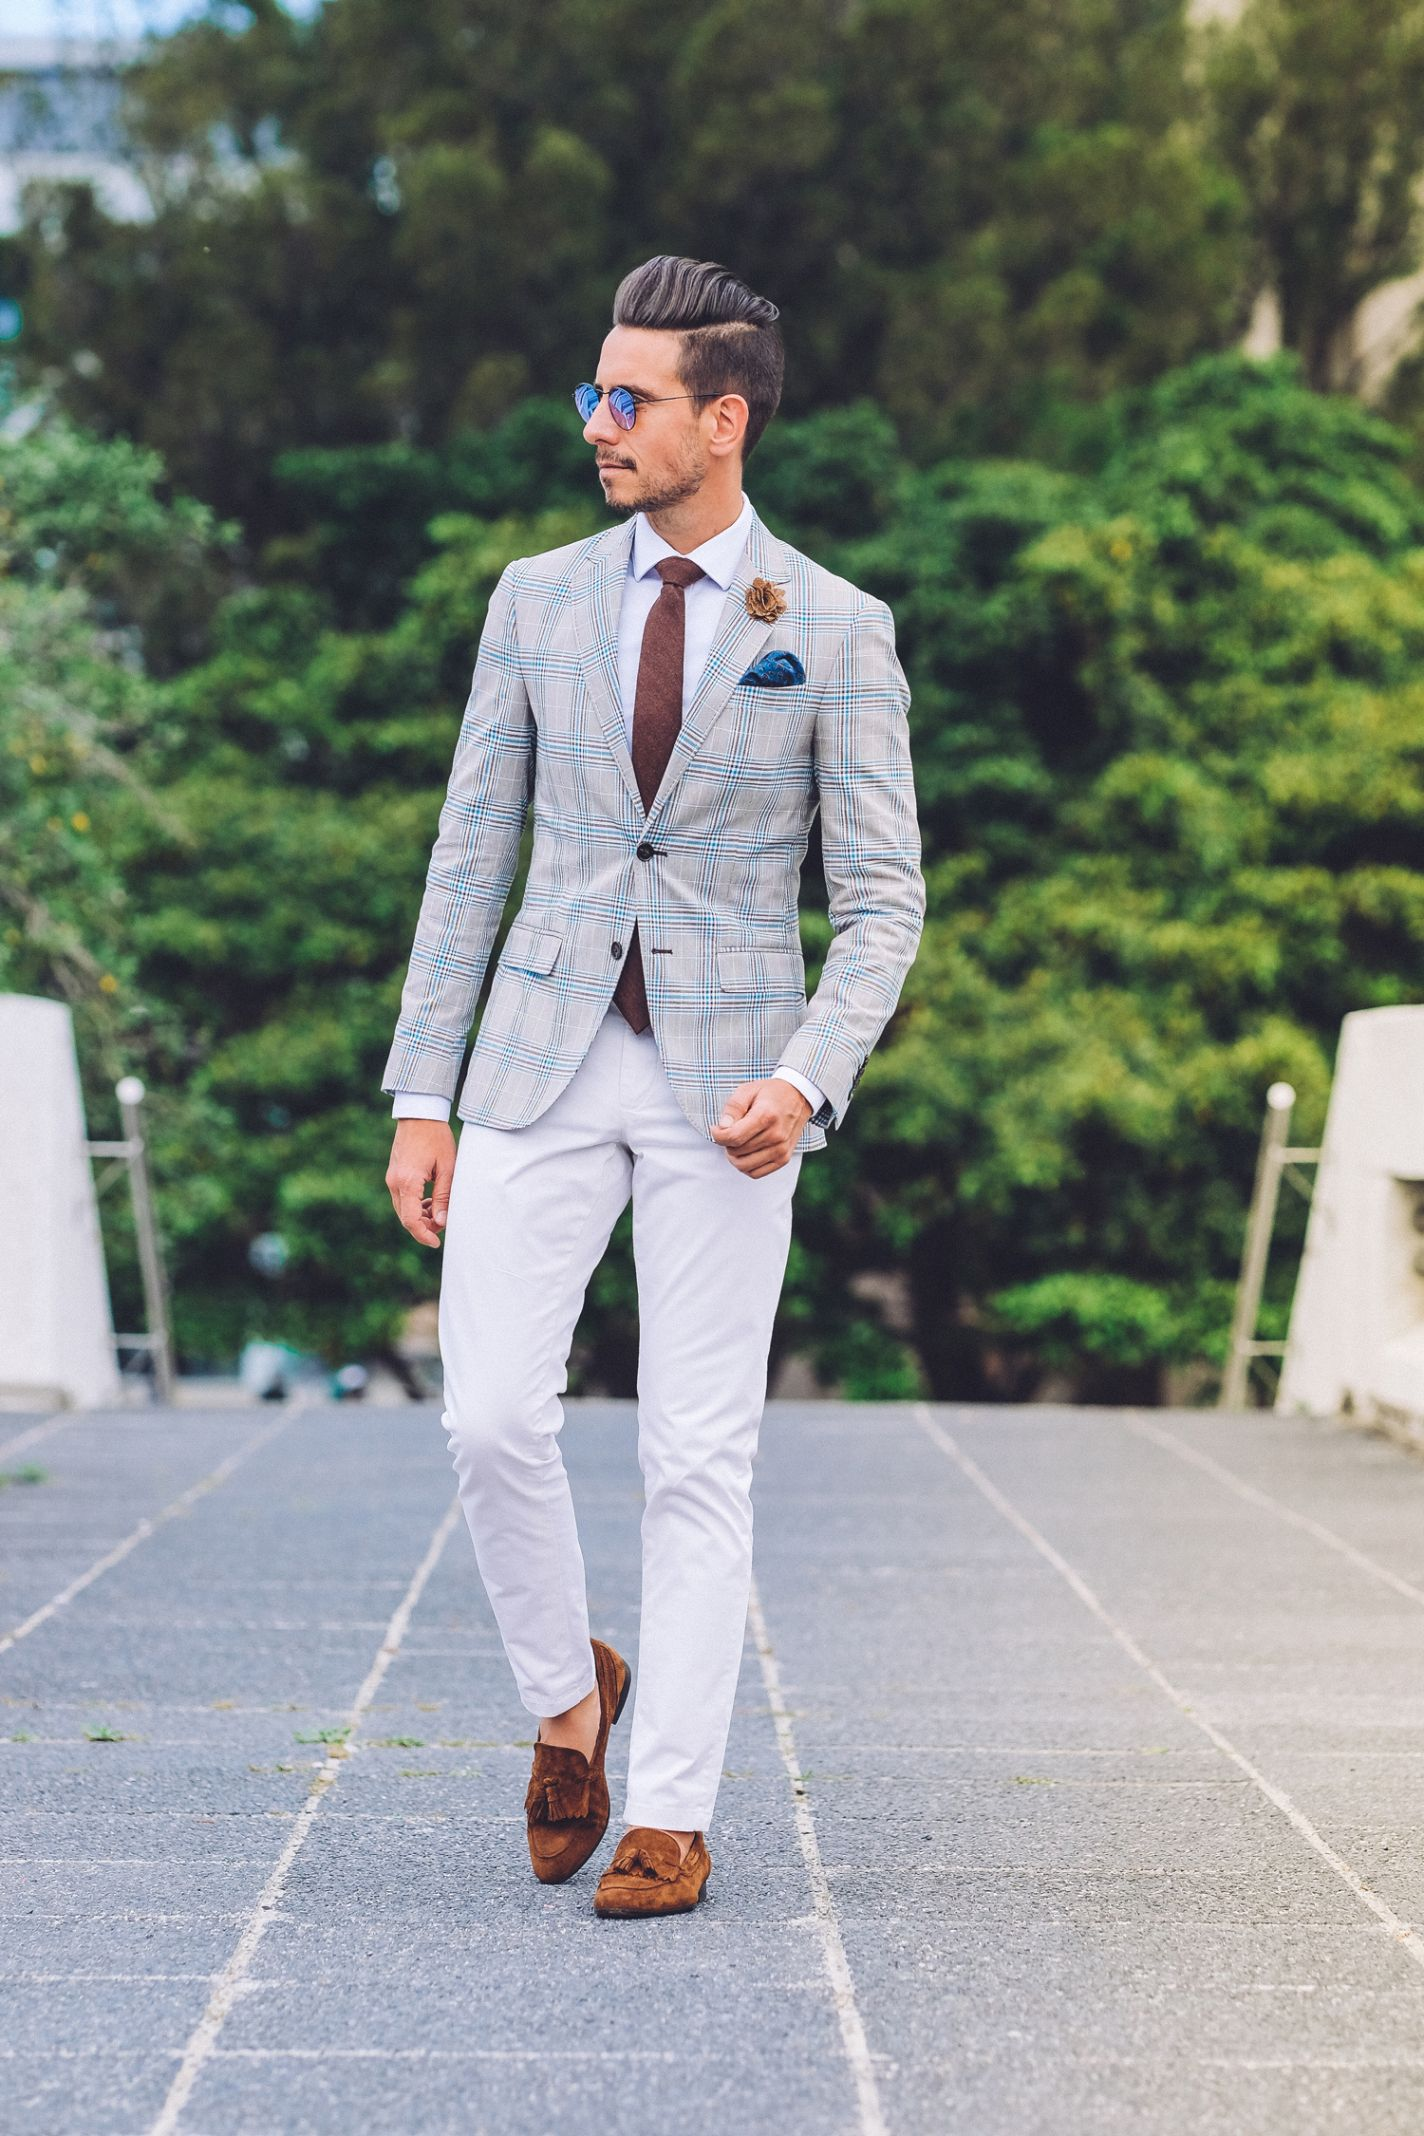 ead173f760d3 Men's Fashion Styles · Fancy, Dapper, Men, Smart, Check Blazer, Chinos,  White Shirt,